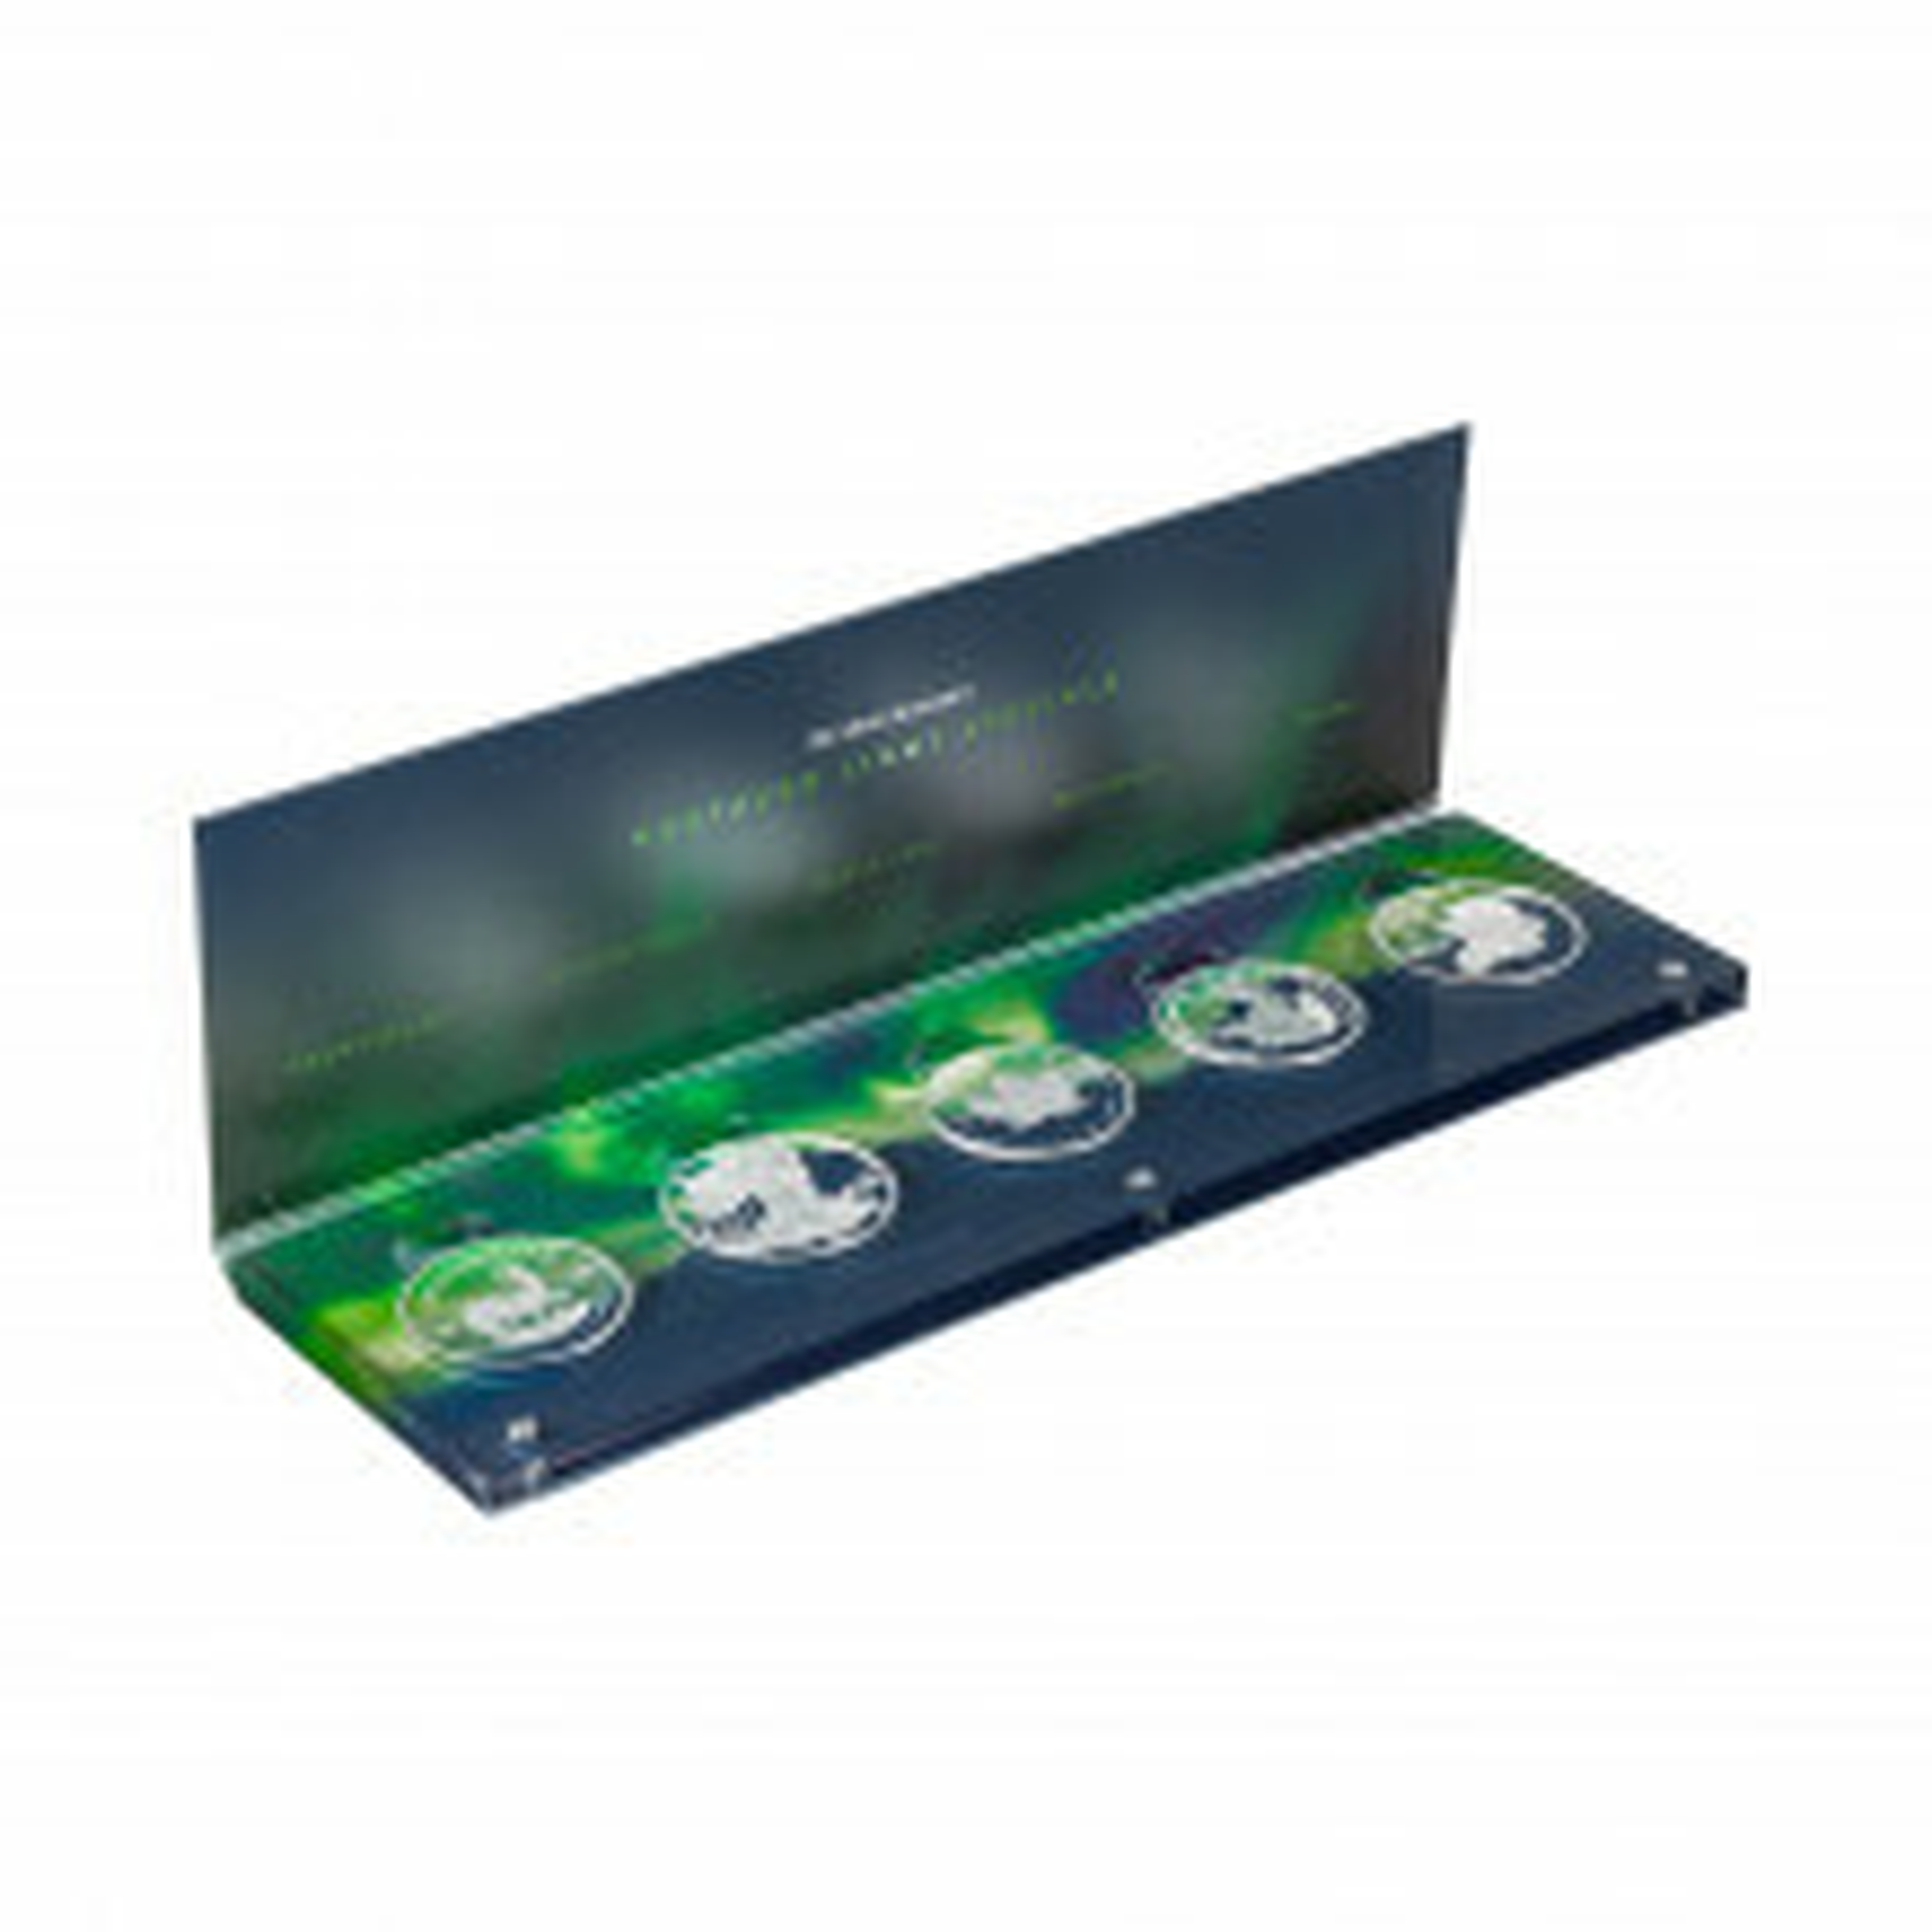 5 x 1 troy ounce zilveren munten Noorderlicht serie